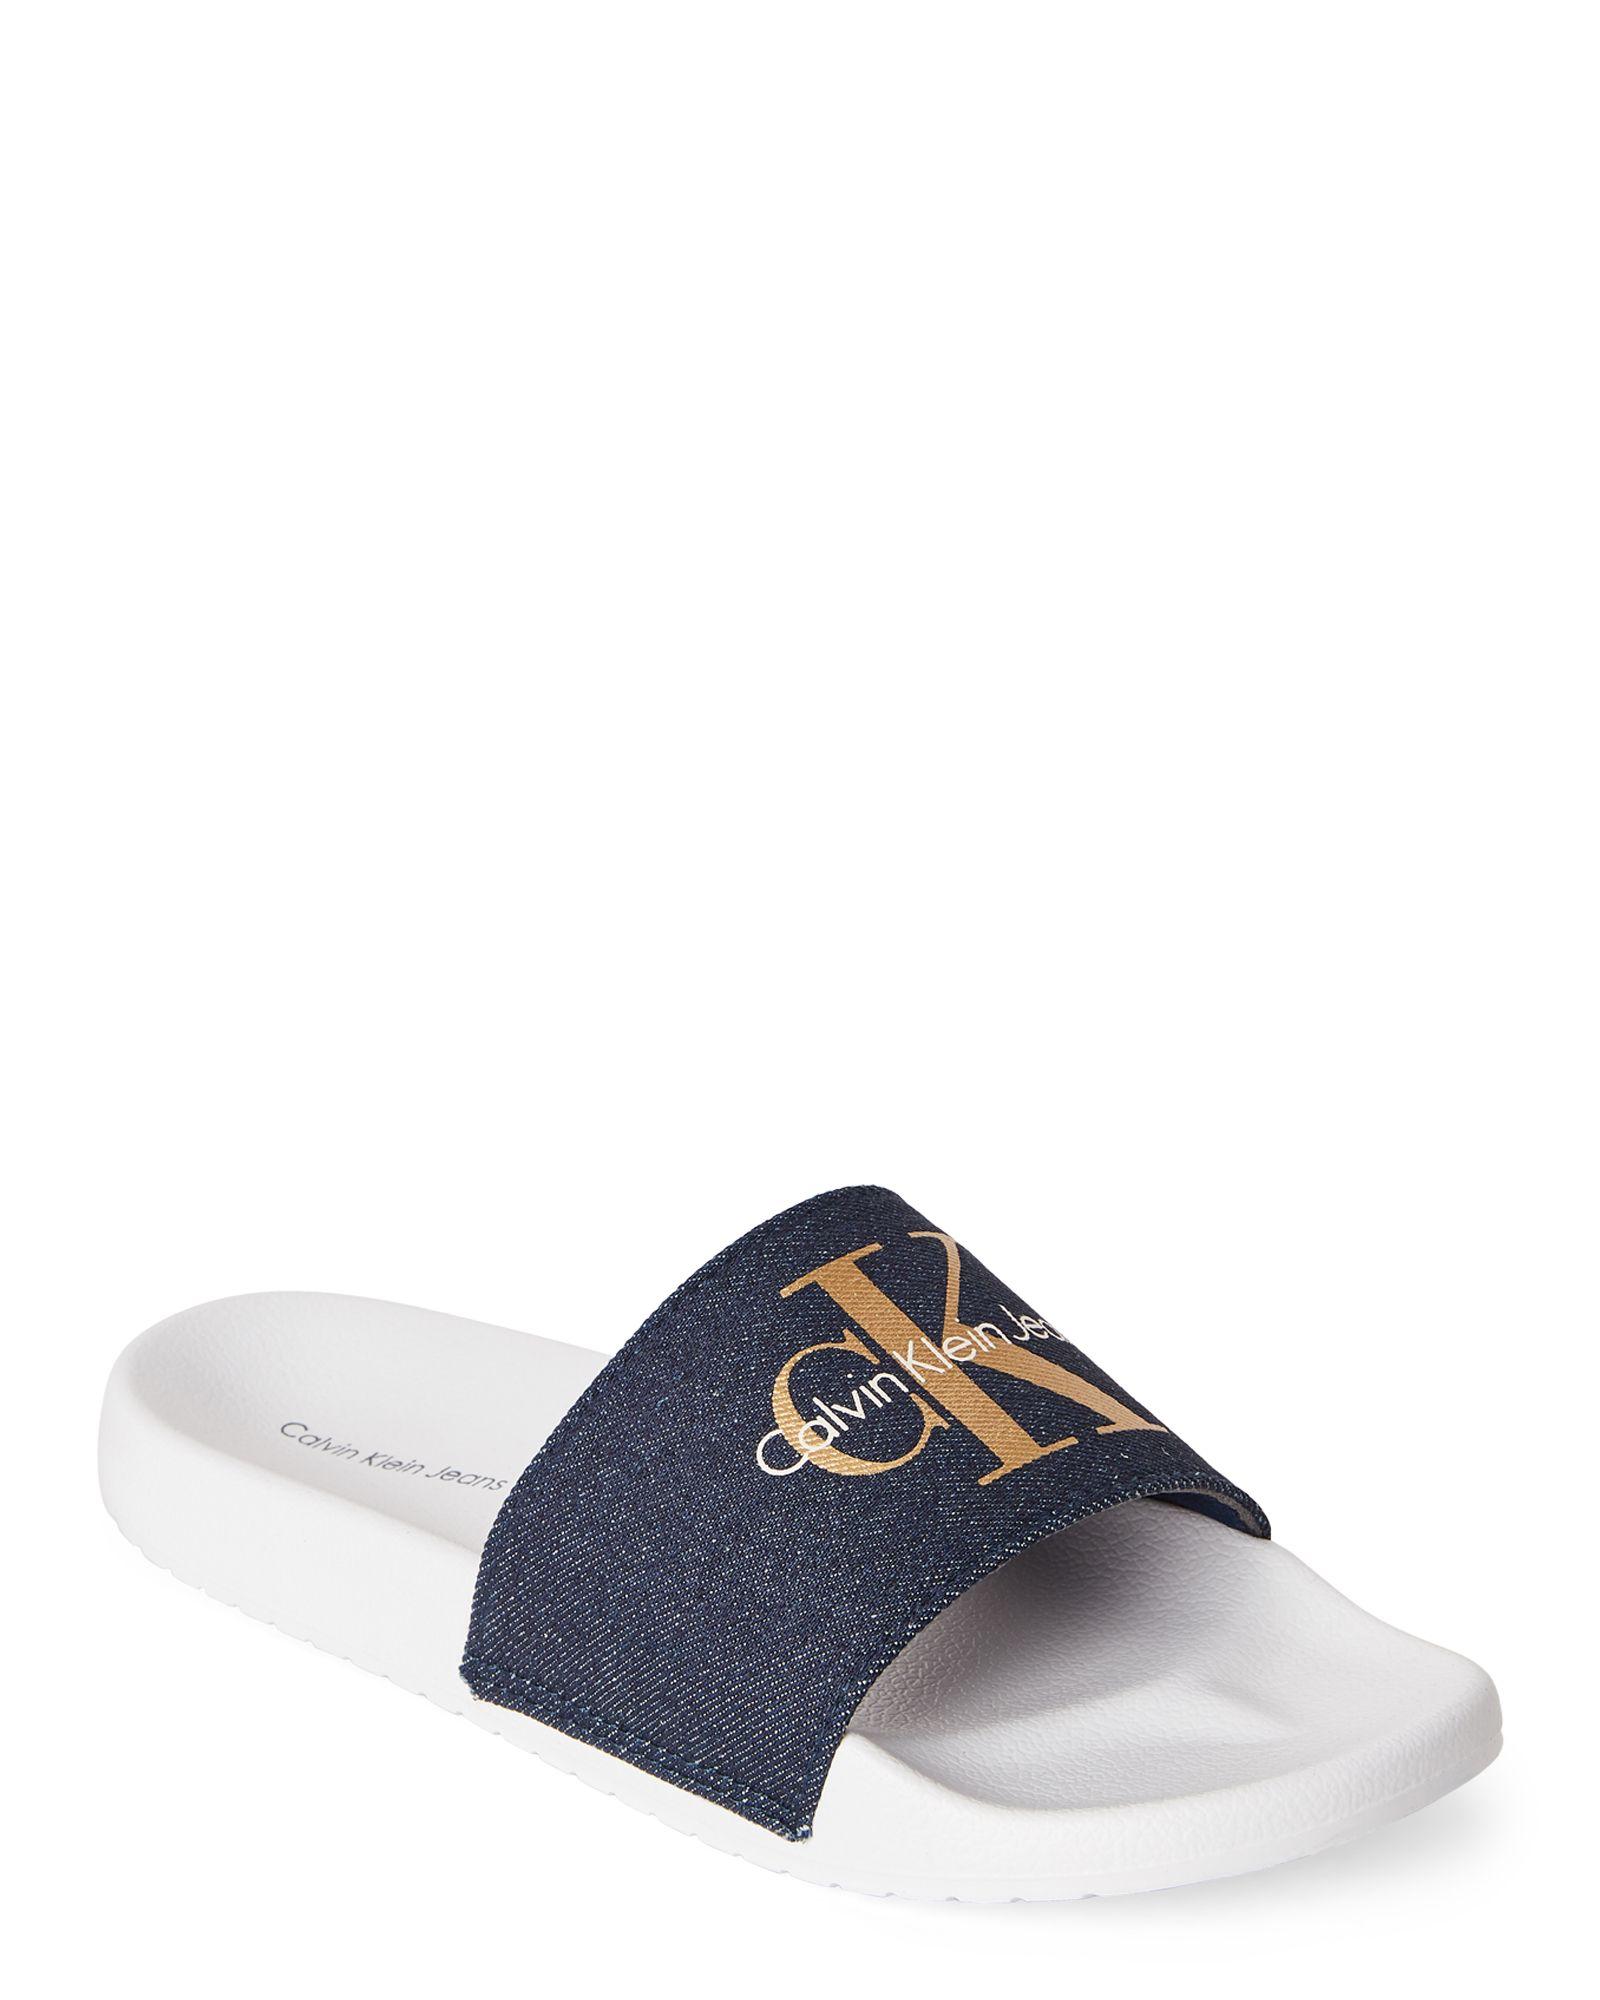 9921ddc625686 Chantal Denim Slide Sandals | *Apparel & Accessories* | Denim slides ...